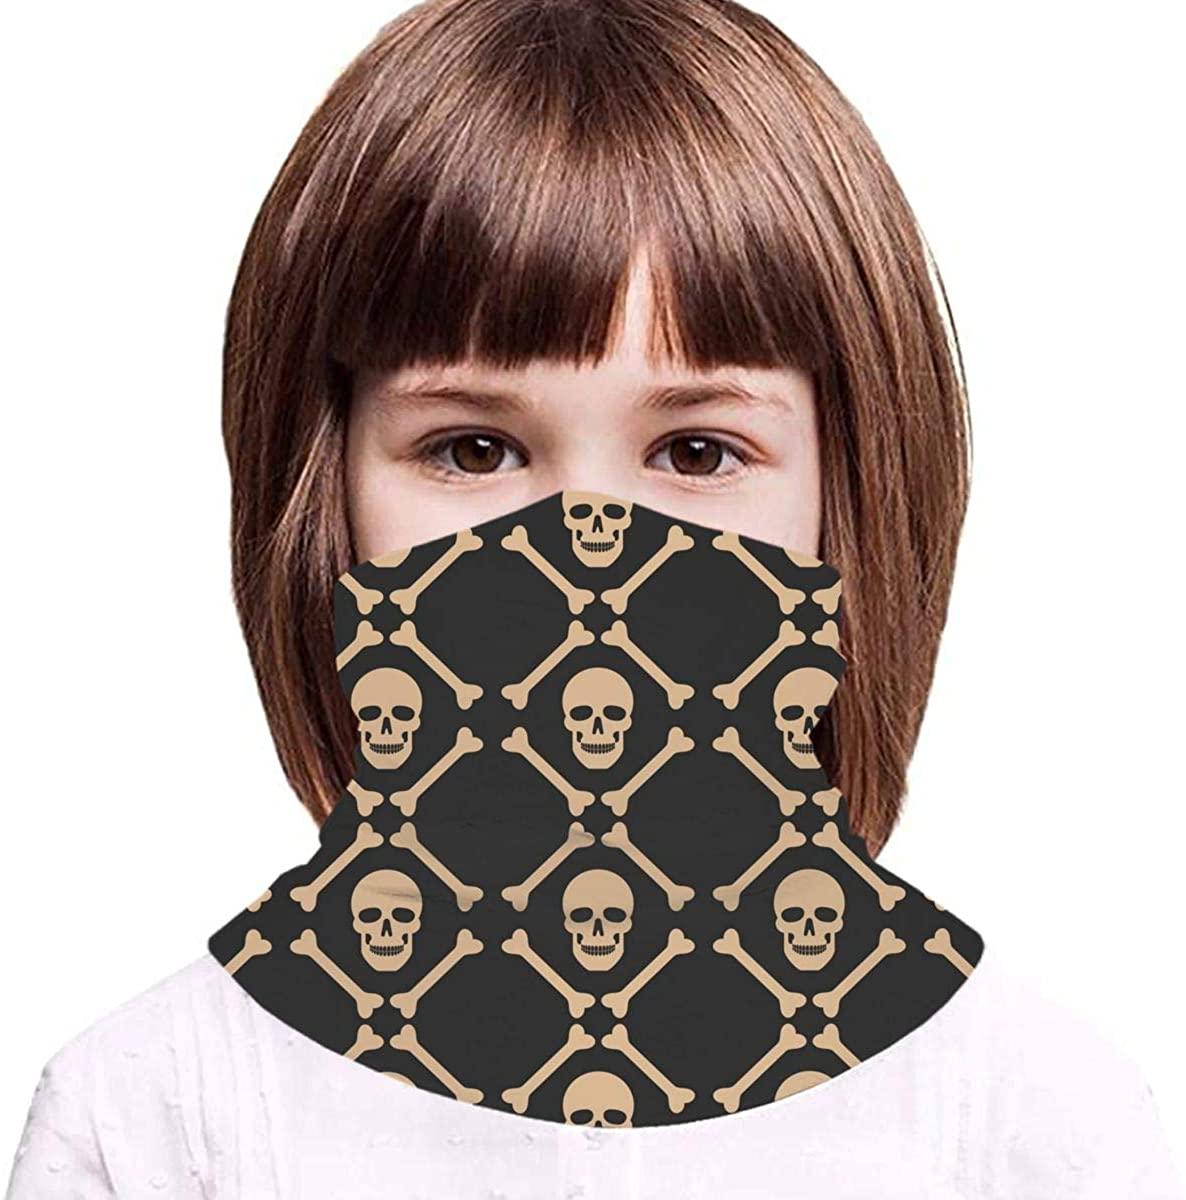 Skull Dark Pattern Neck Gaiter Balaclava Bandana Headwear Cooling Scarf Variety Face Towel